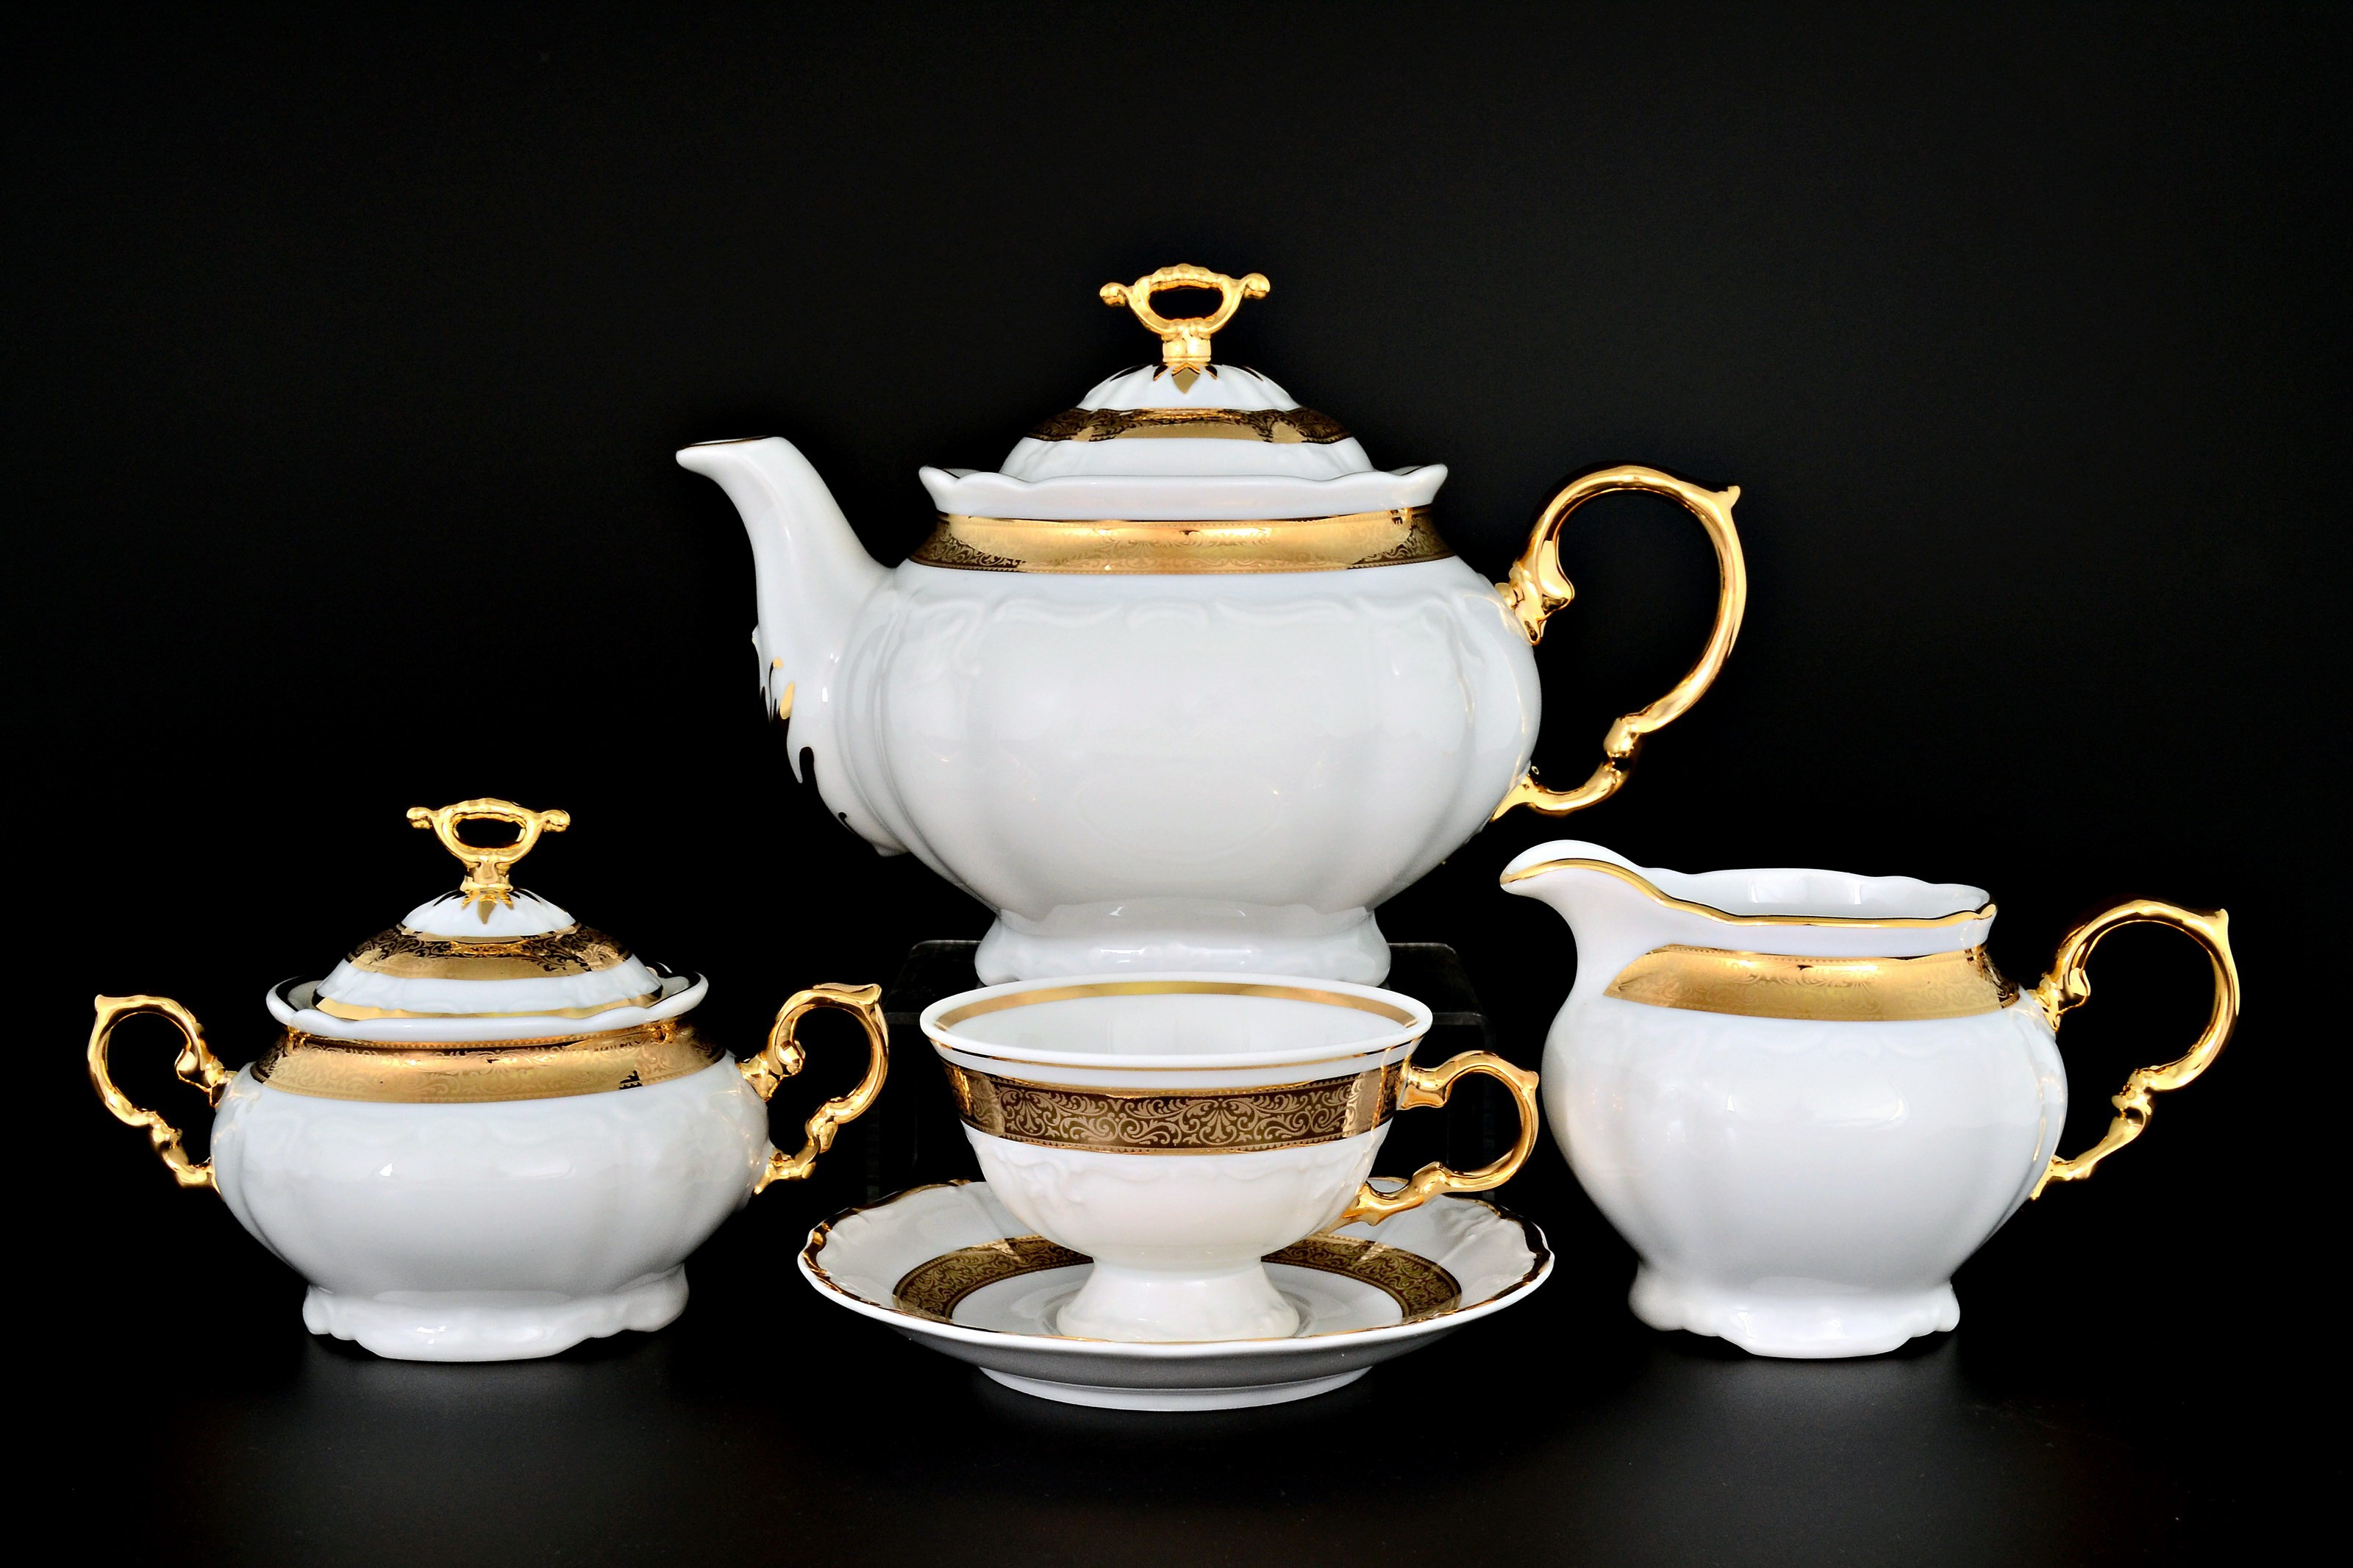 Чайный сервиз МАРИЯ-ЛУИЗА ЗОЛОТАЯ ЛЕНТА от Thun 1794 a.s. на 6 персон